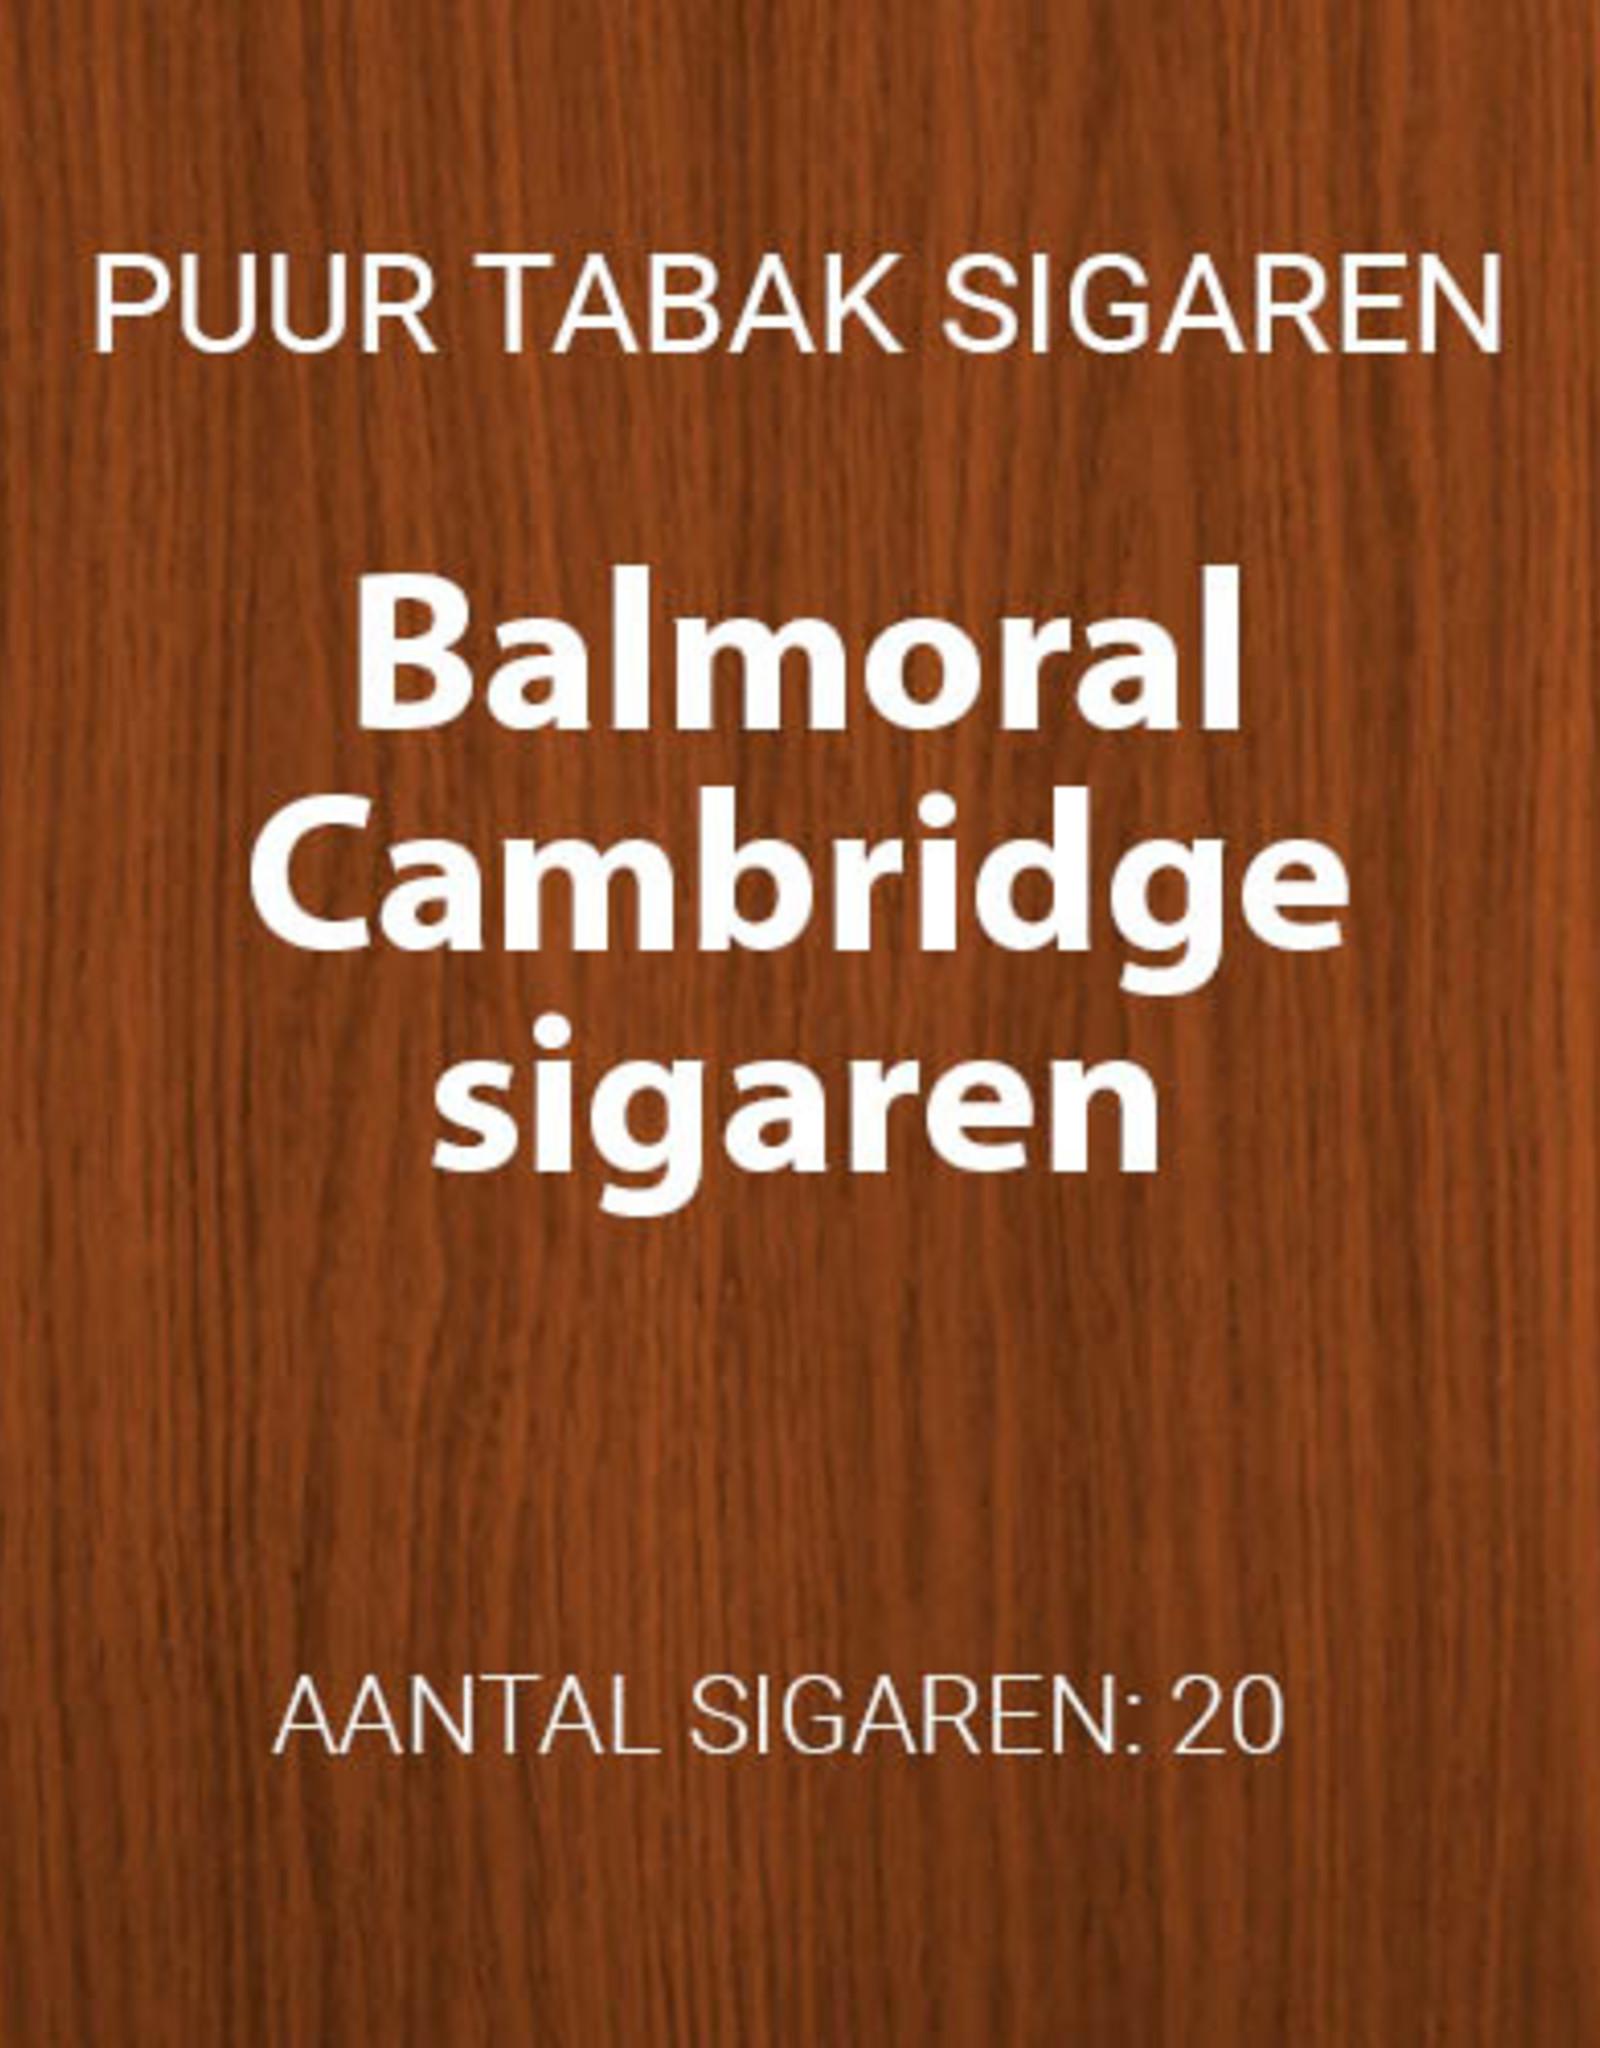 Balmoral Cambridge Tuitcigarillos